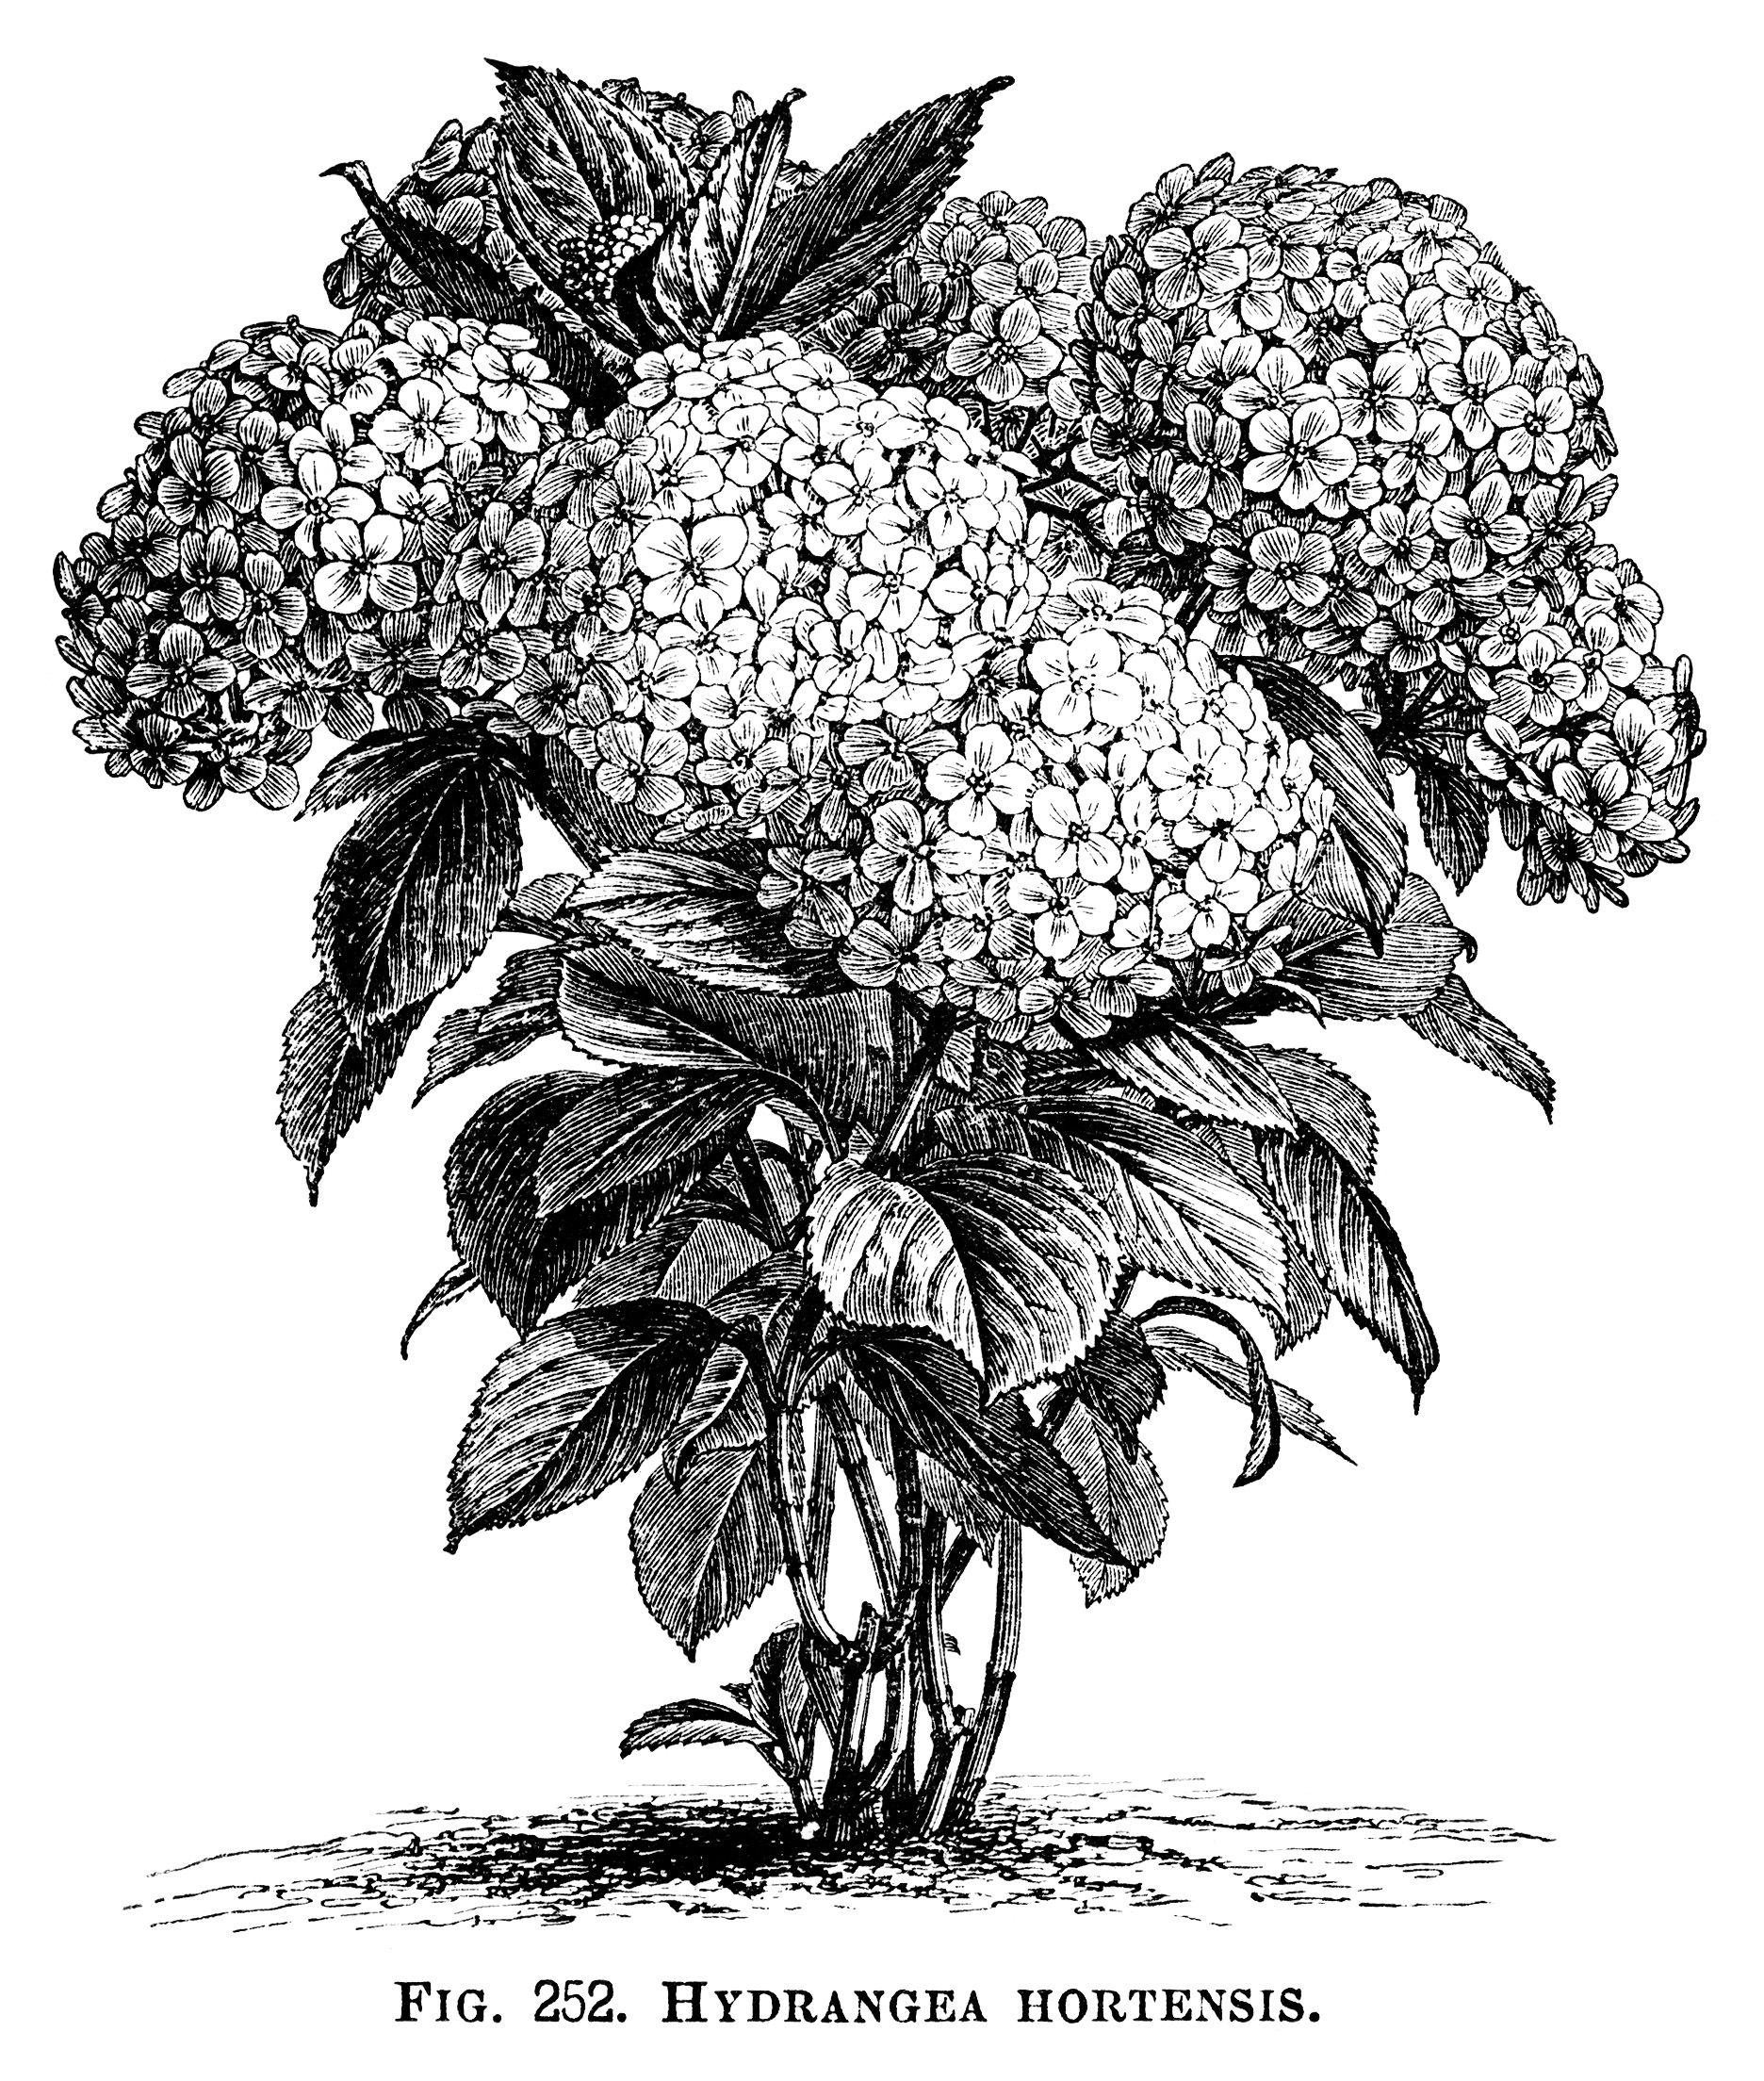 Hydrangea hortensis hydrangea flower black and white graphics hydrangea hortensis hydrangea flower black and white graphics vintage flower illustration printable mightylinksfo